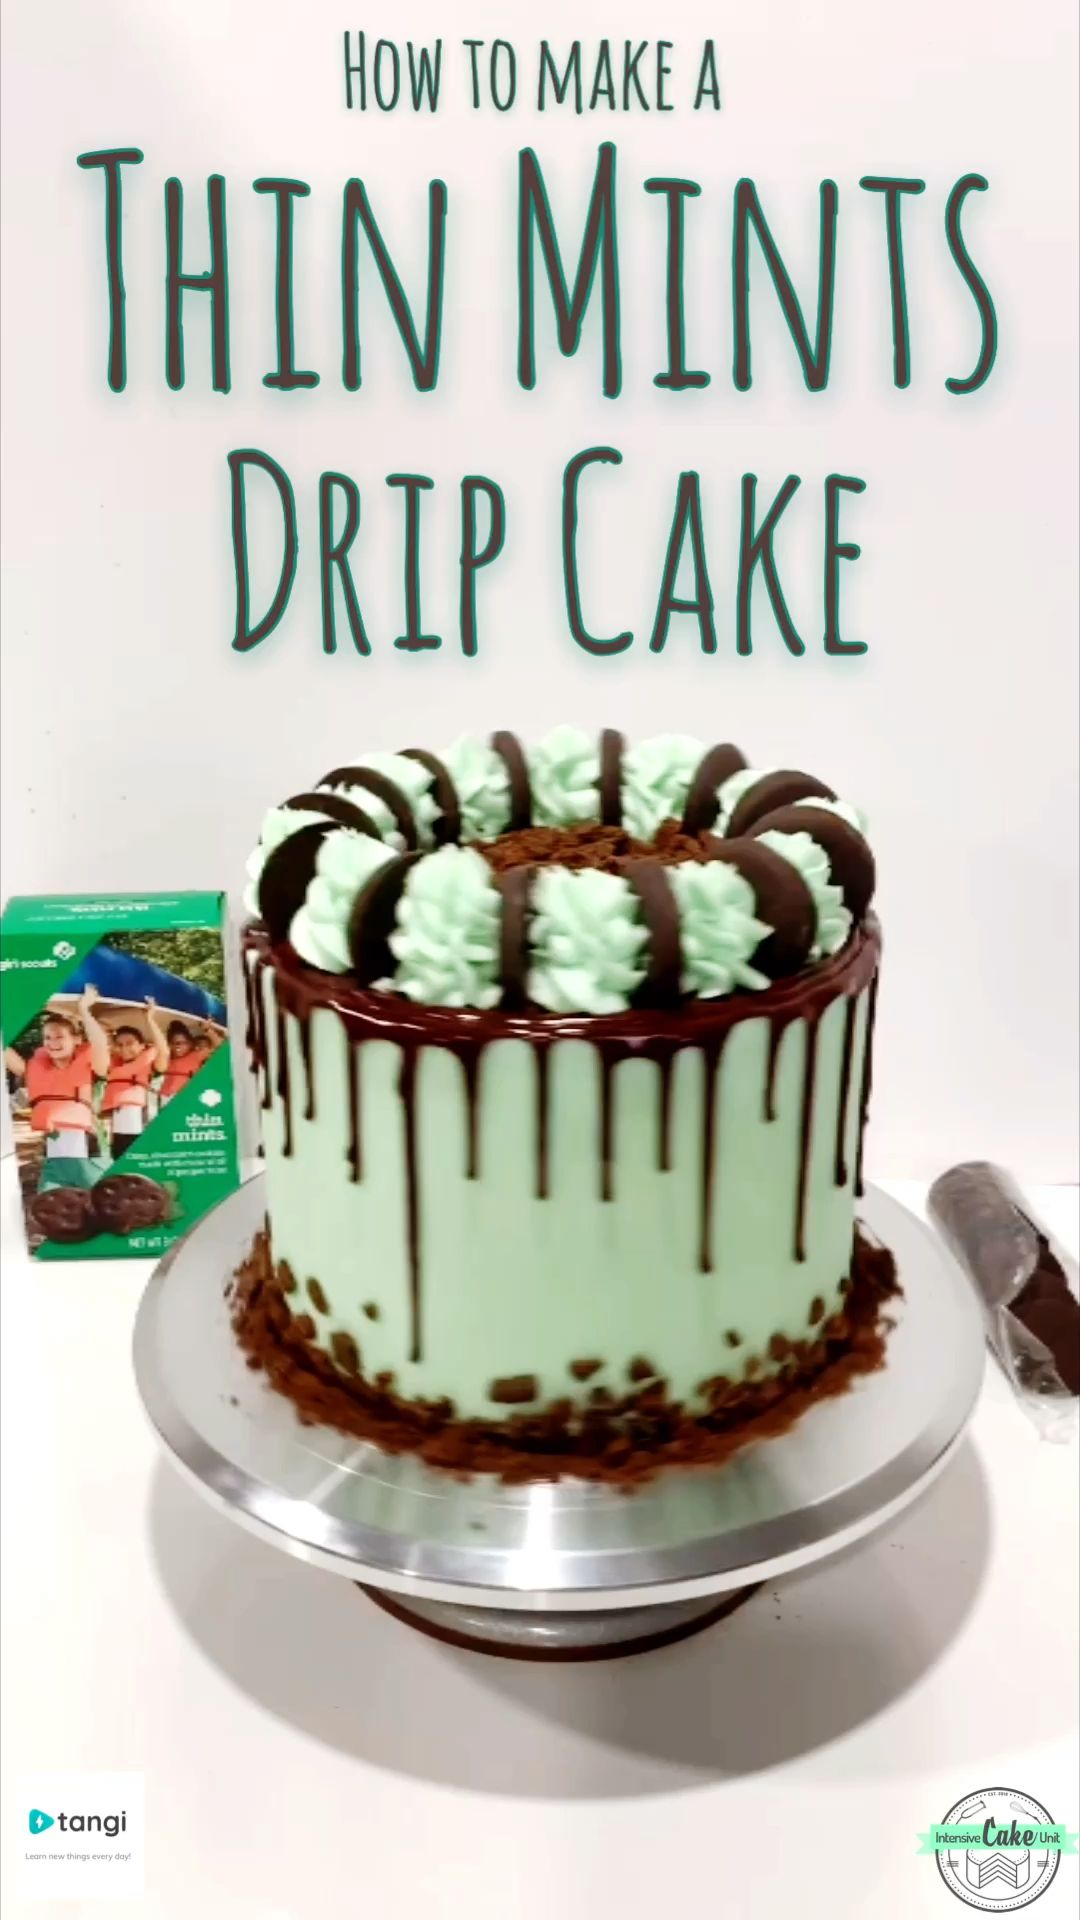 Thin Mints Drip Cake